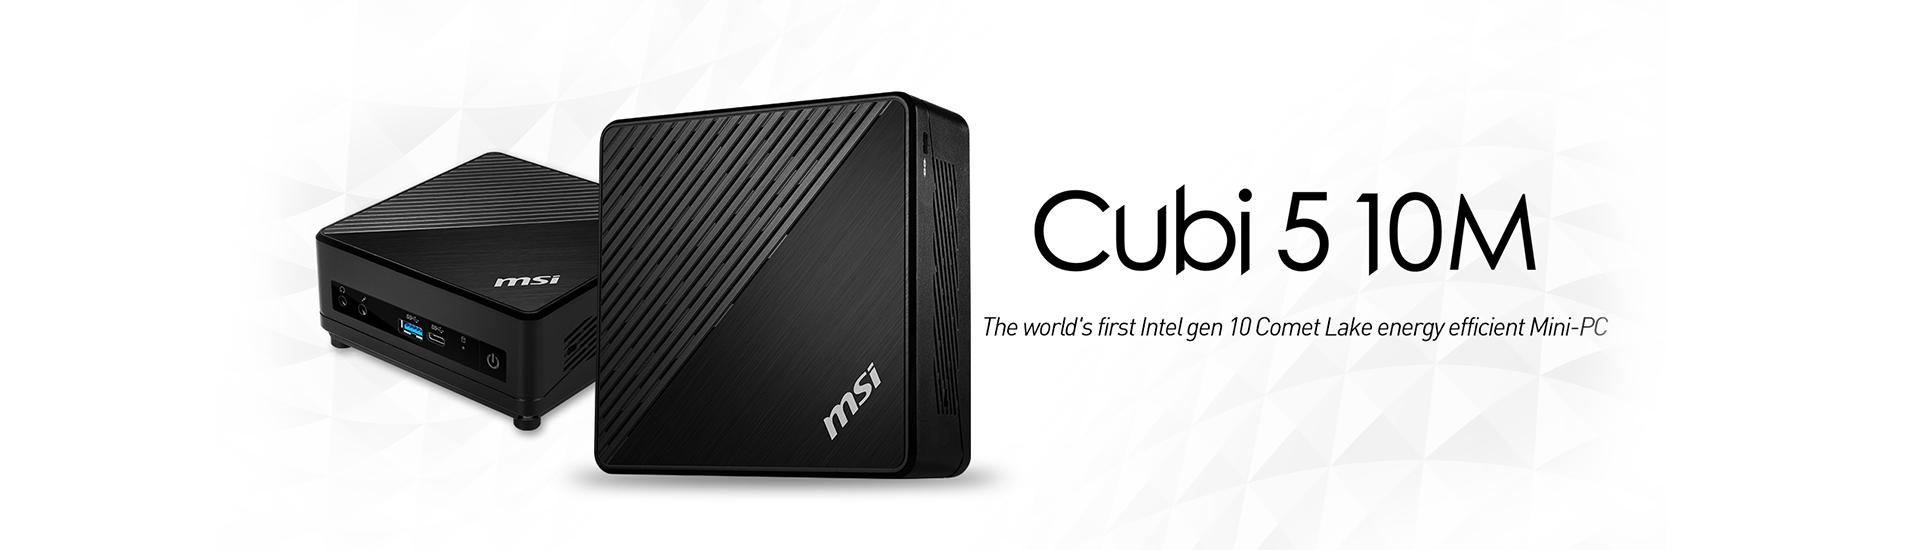 Cubi Series